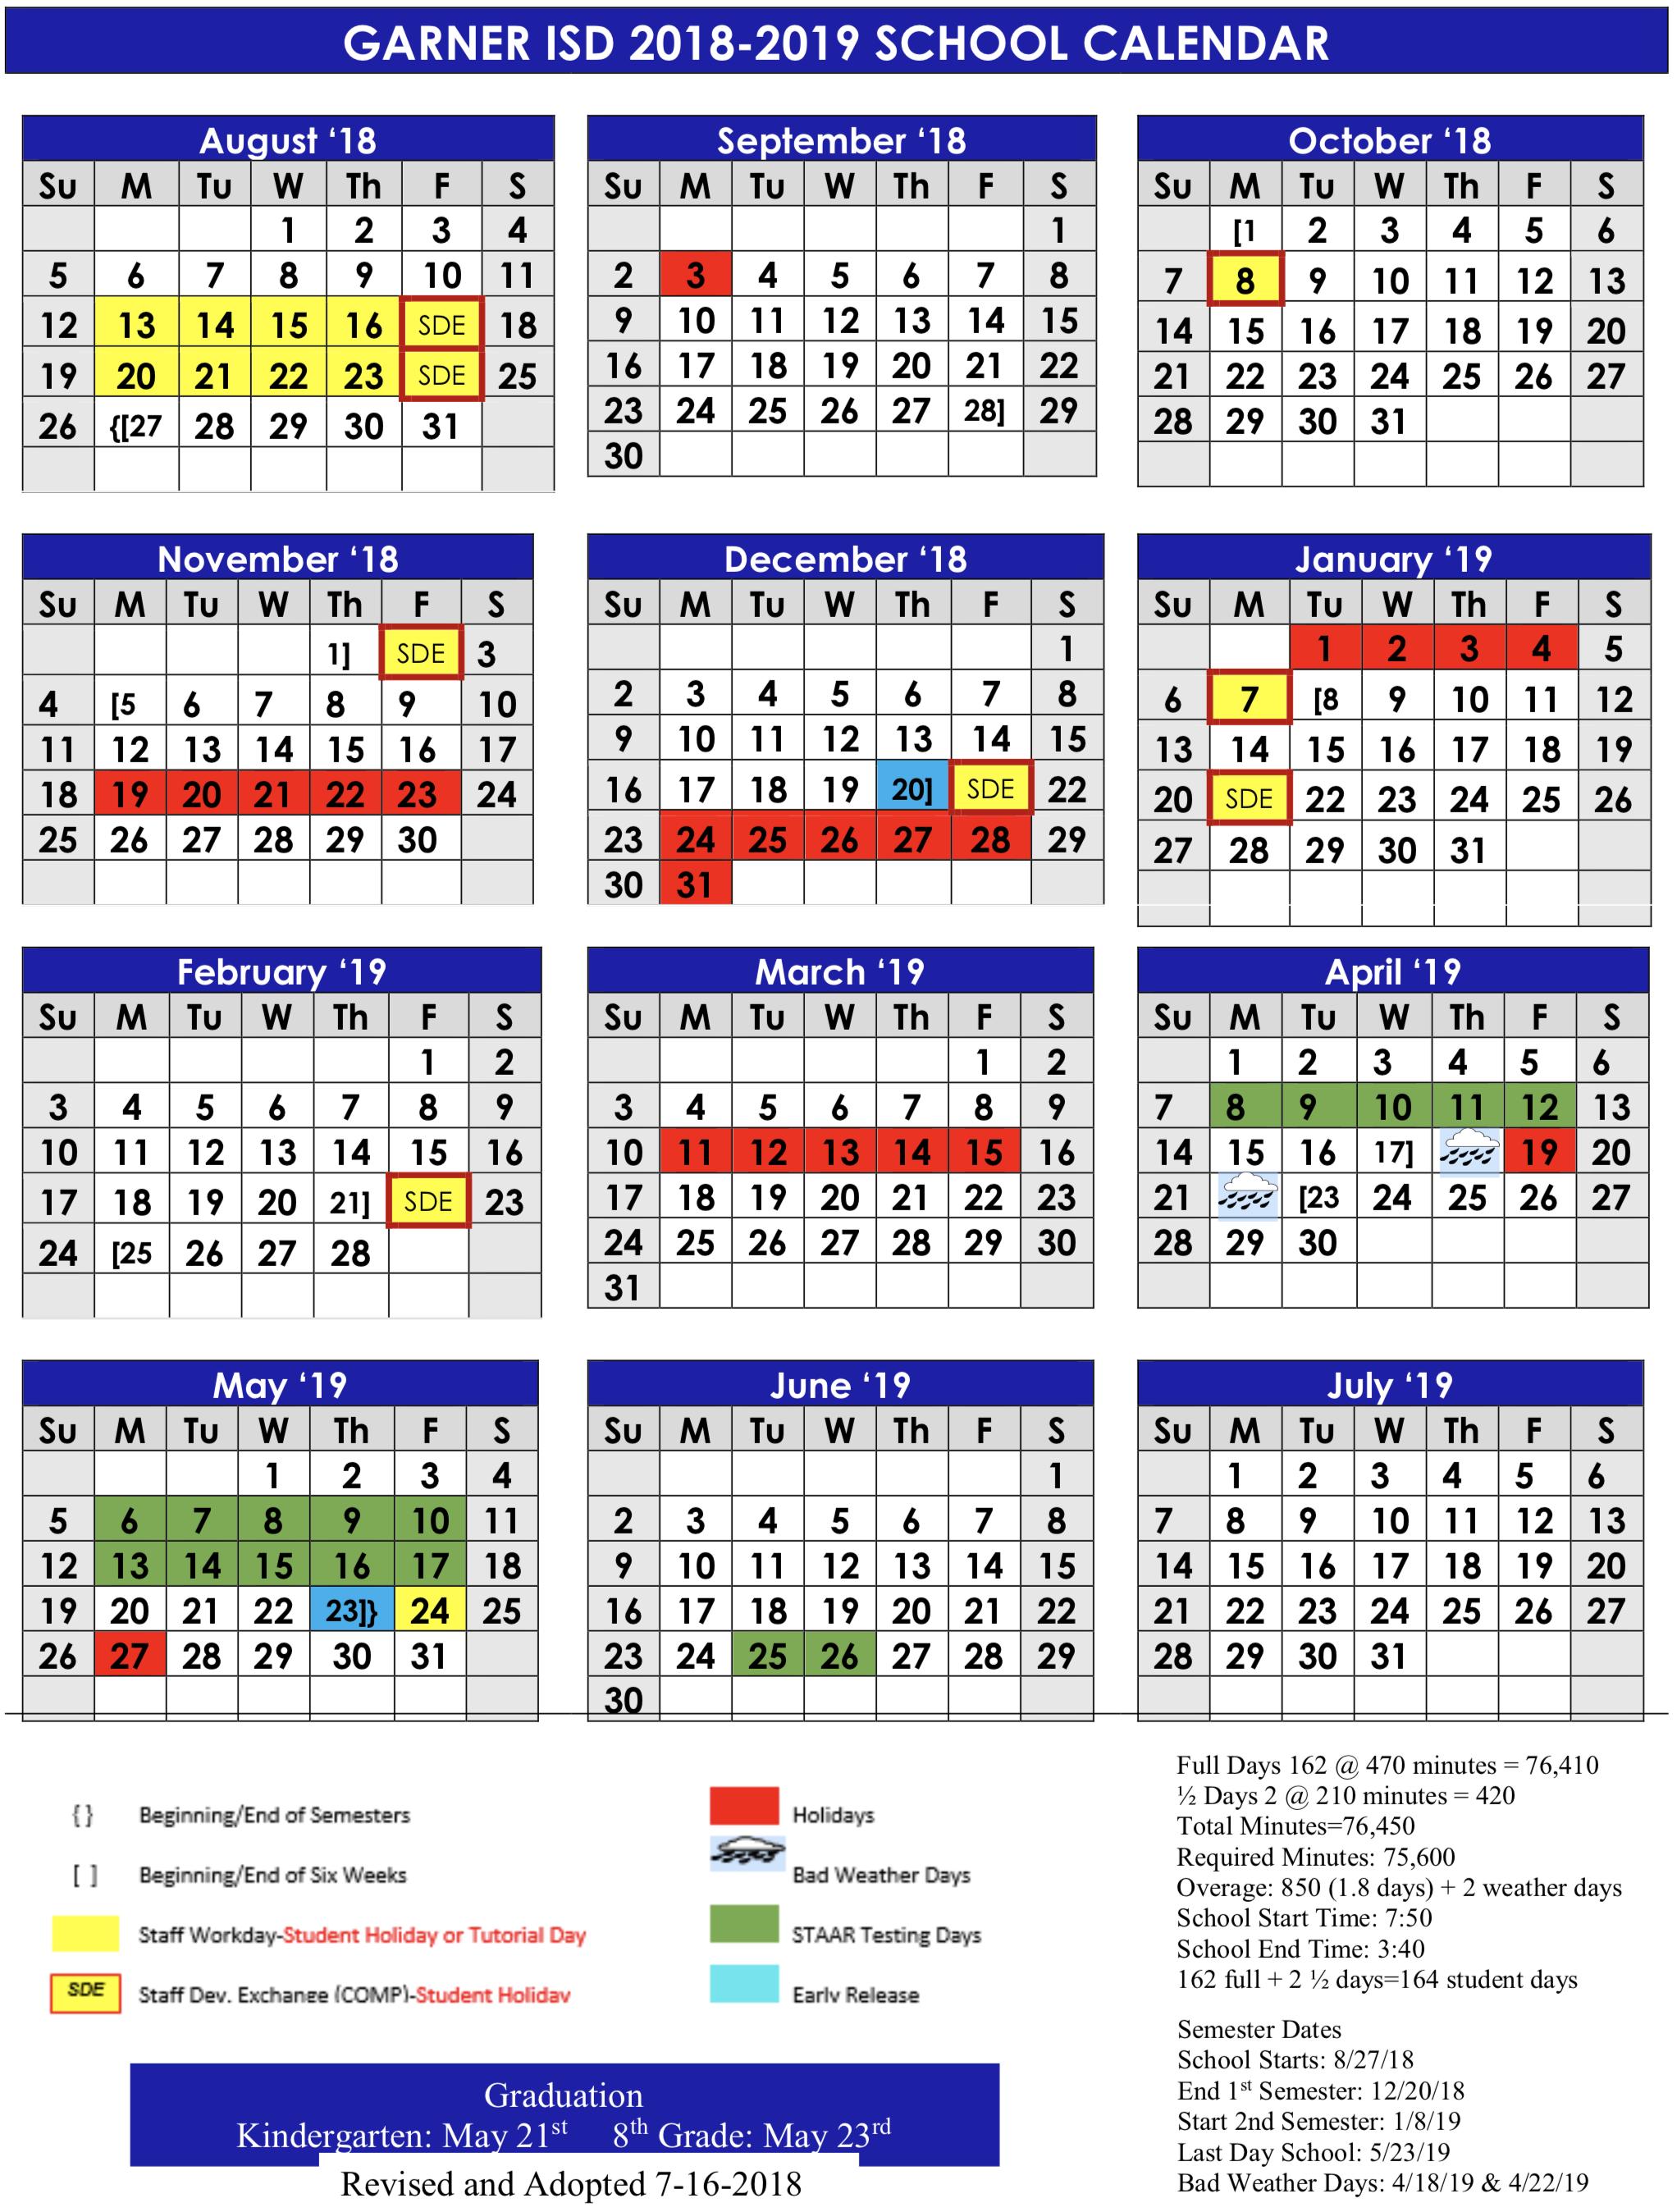 Calendar - Garner Isd in Angelo State Printable Academic Calendar